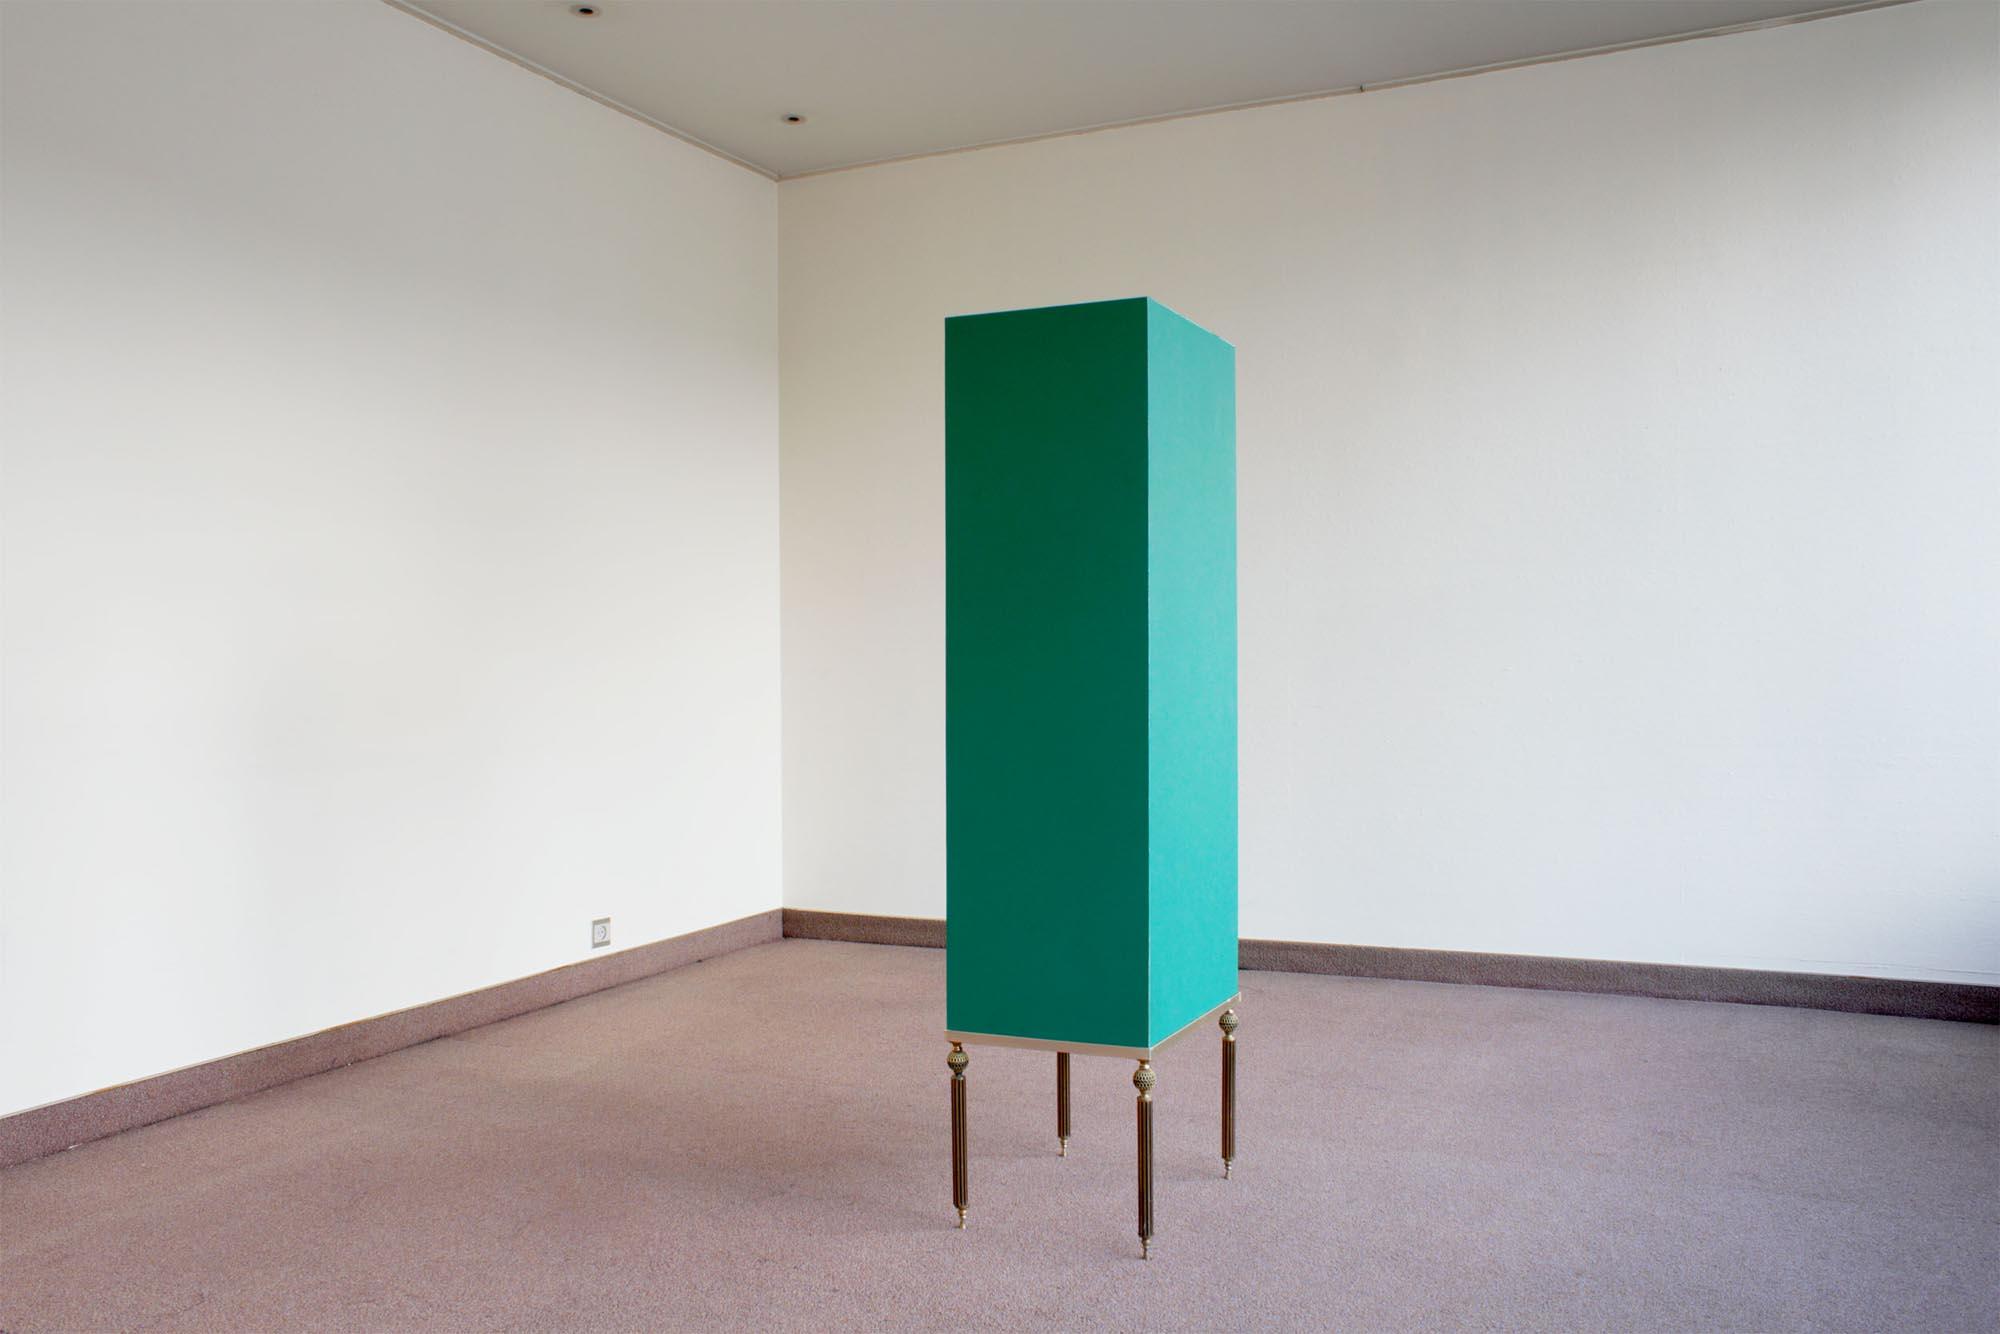 Sibylle-Eimermacher-Compact-still-life-2-01